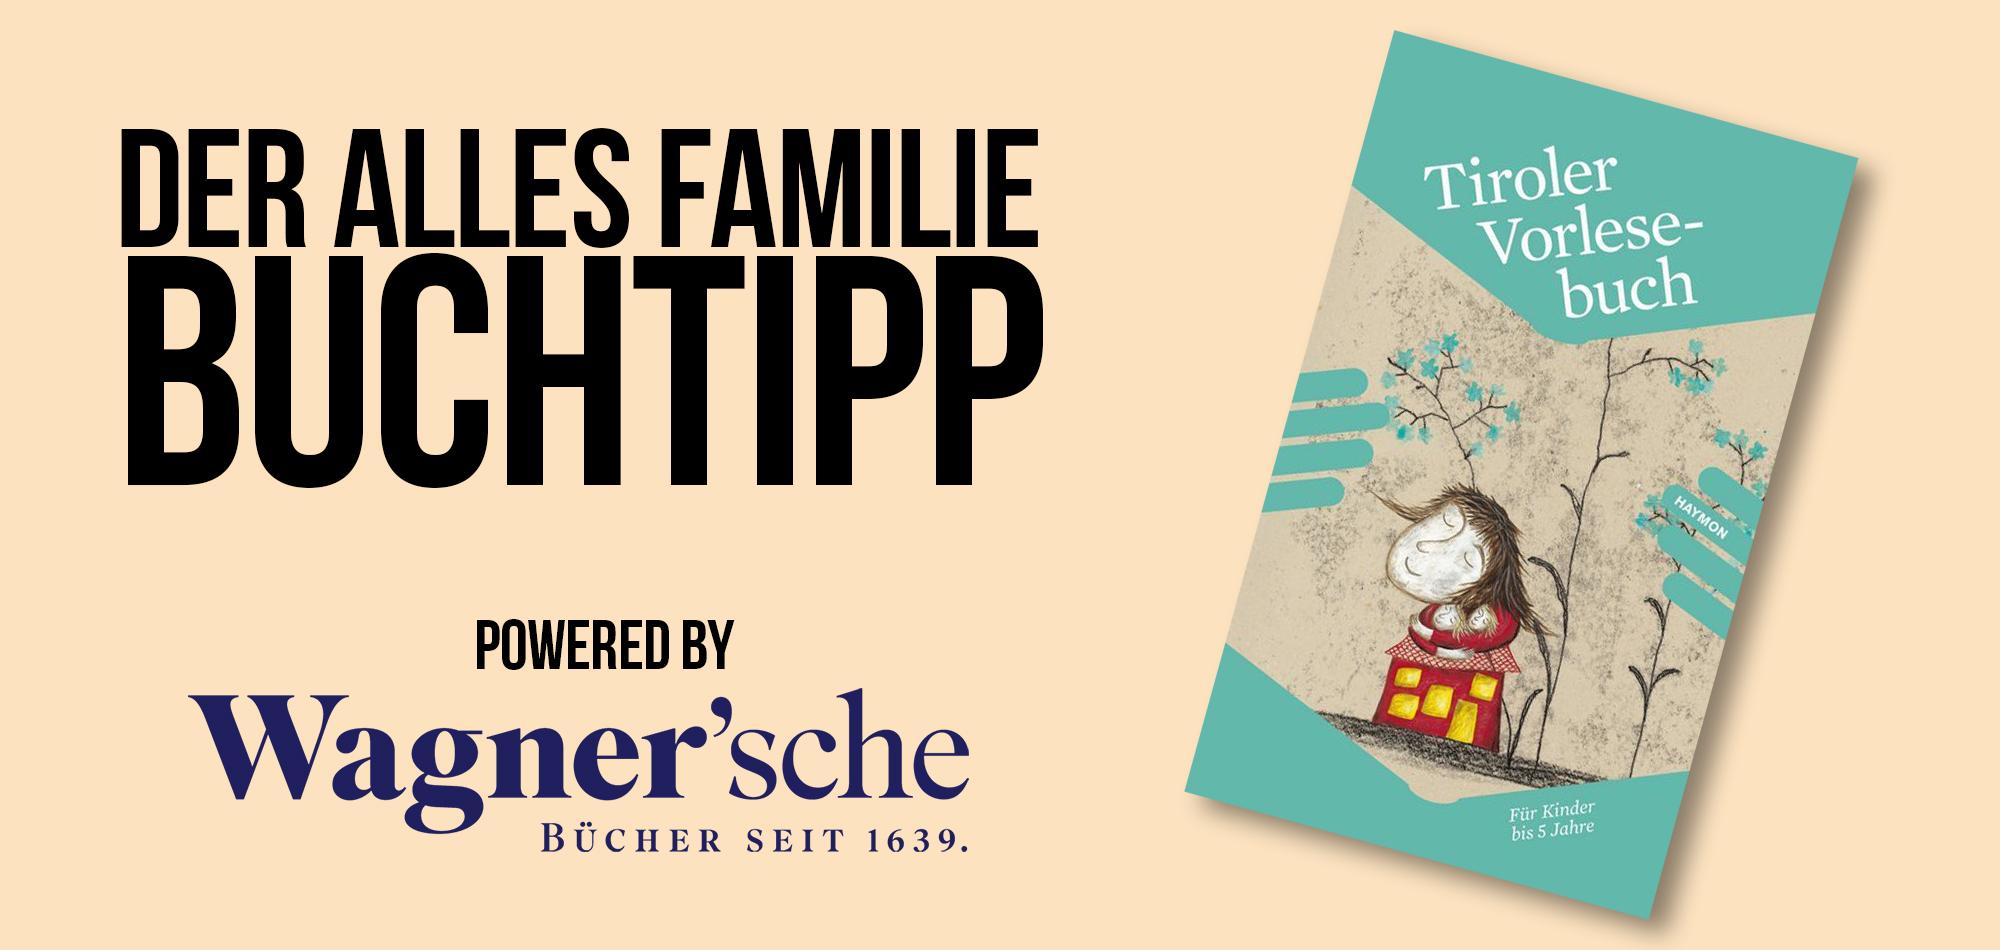 Das Tiroler Vorlesebuch Band 1